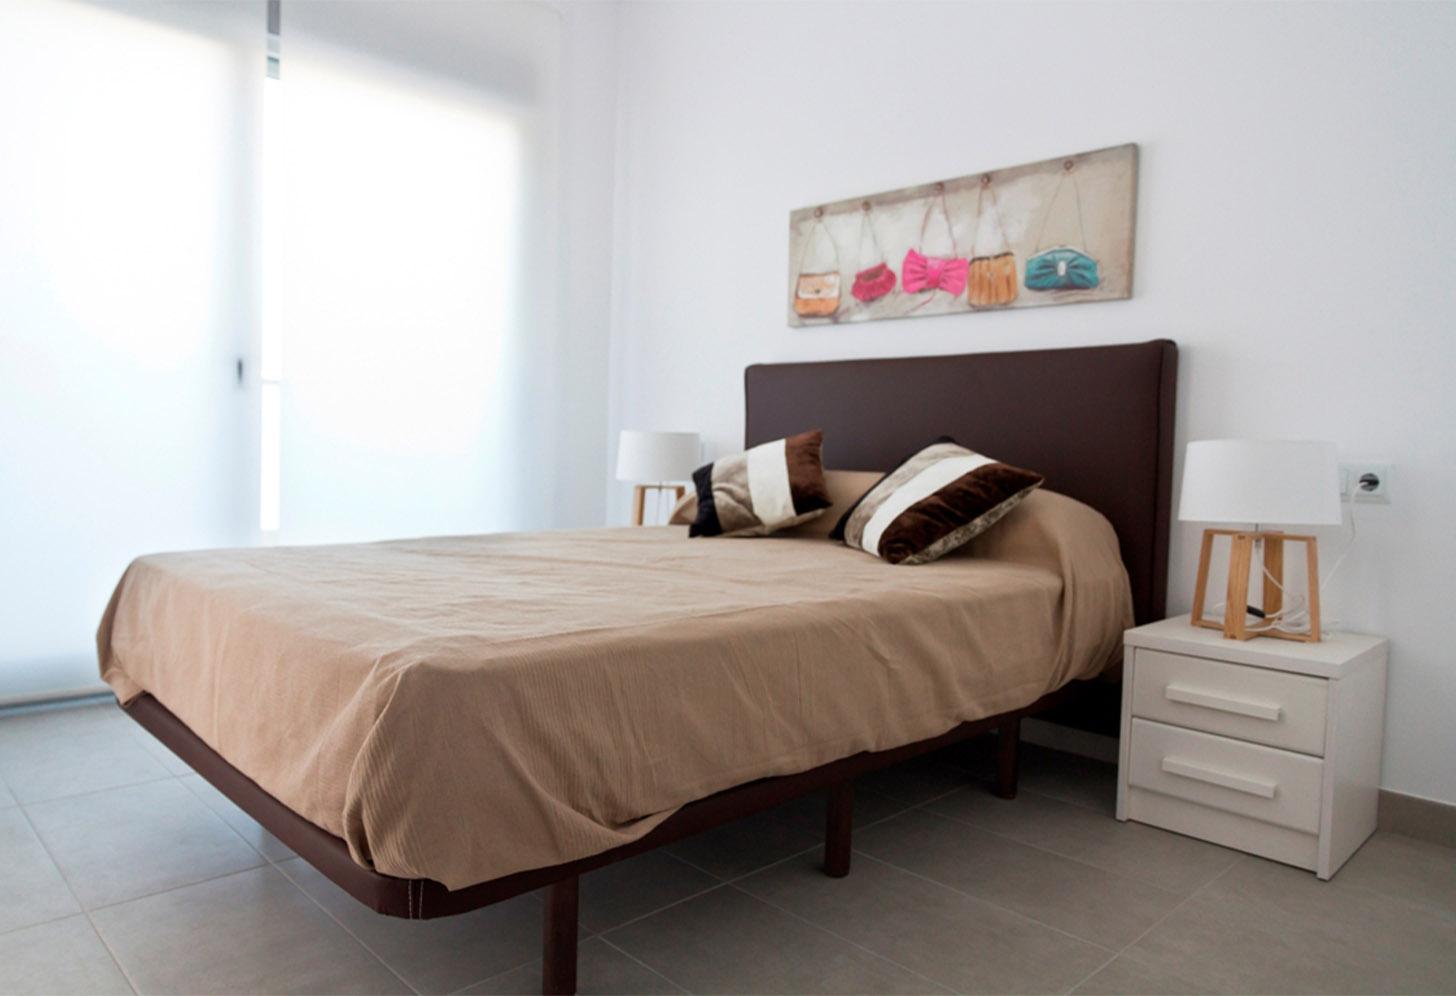 immobilier neuf espagne costa blanca on-n3 duplex higuerigas chambre